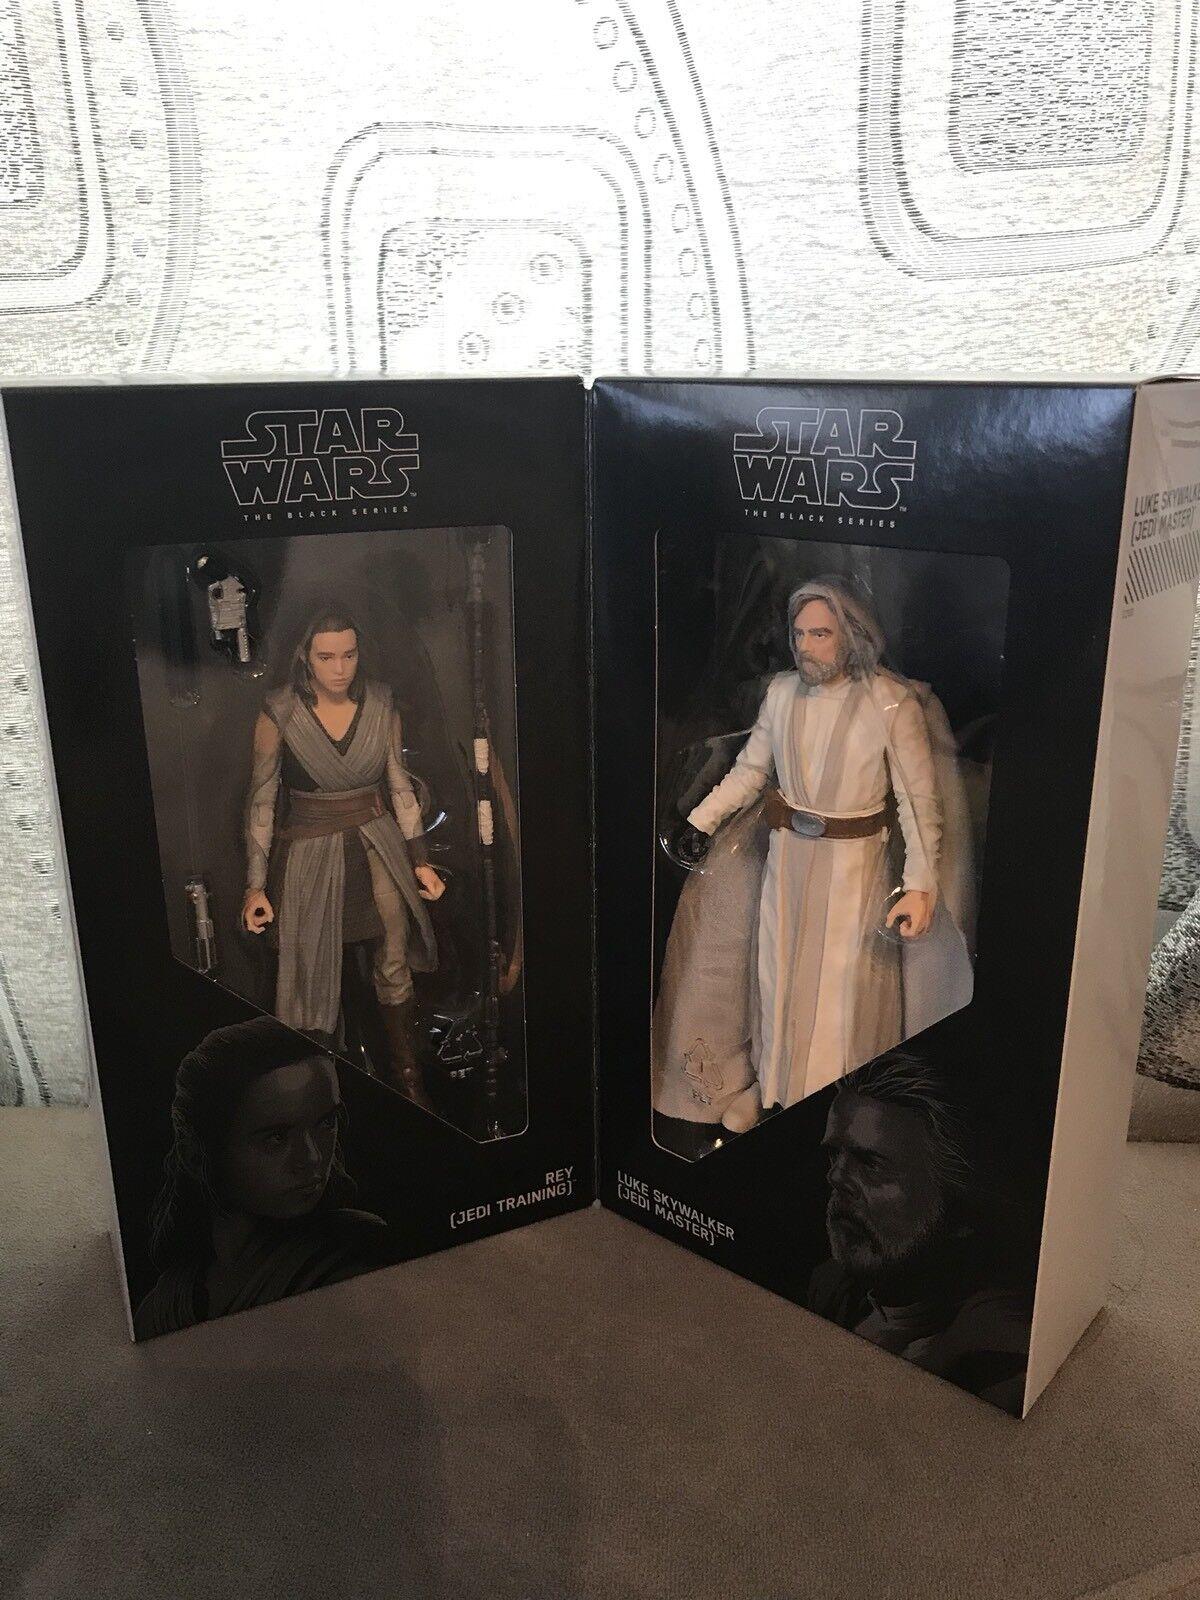 Luke Skywalker Jedi Master & Rey entrenamiento Jedi Estrella Wars Conjunto de La Serie Negra